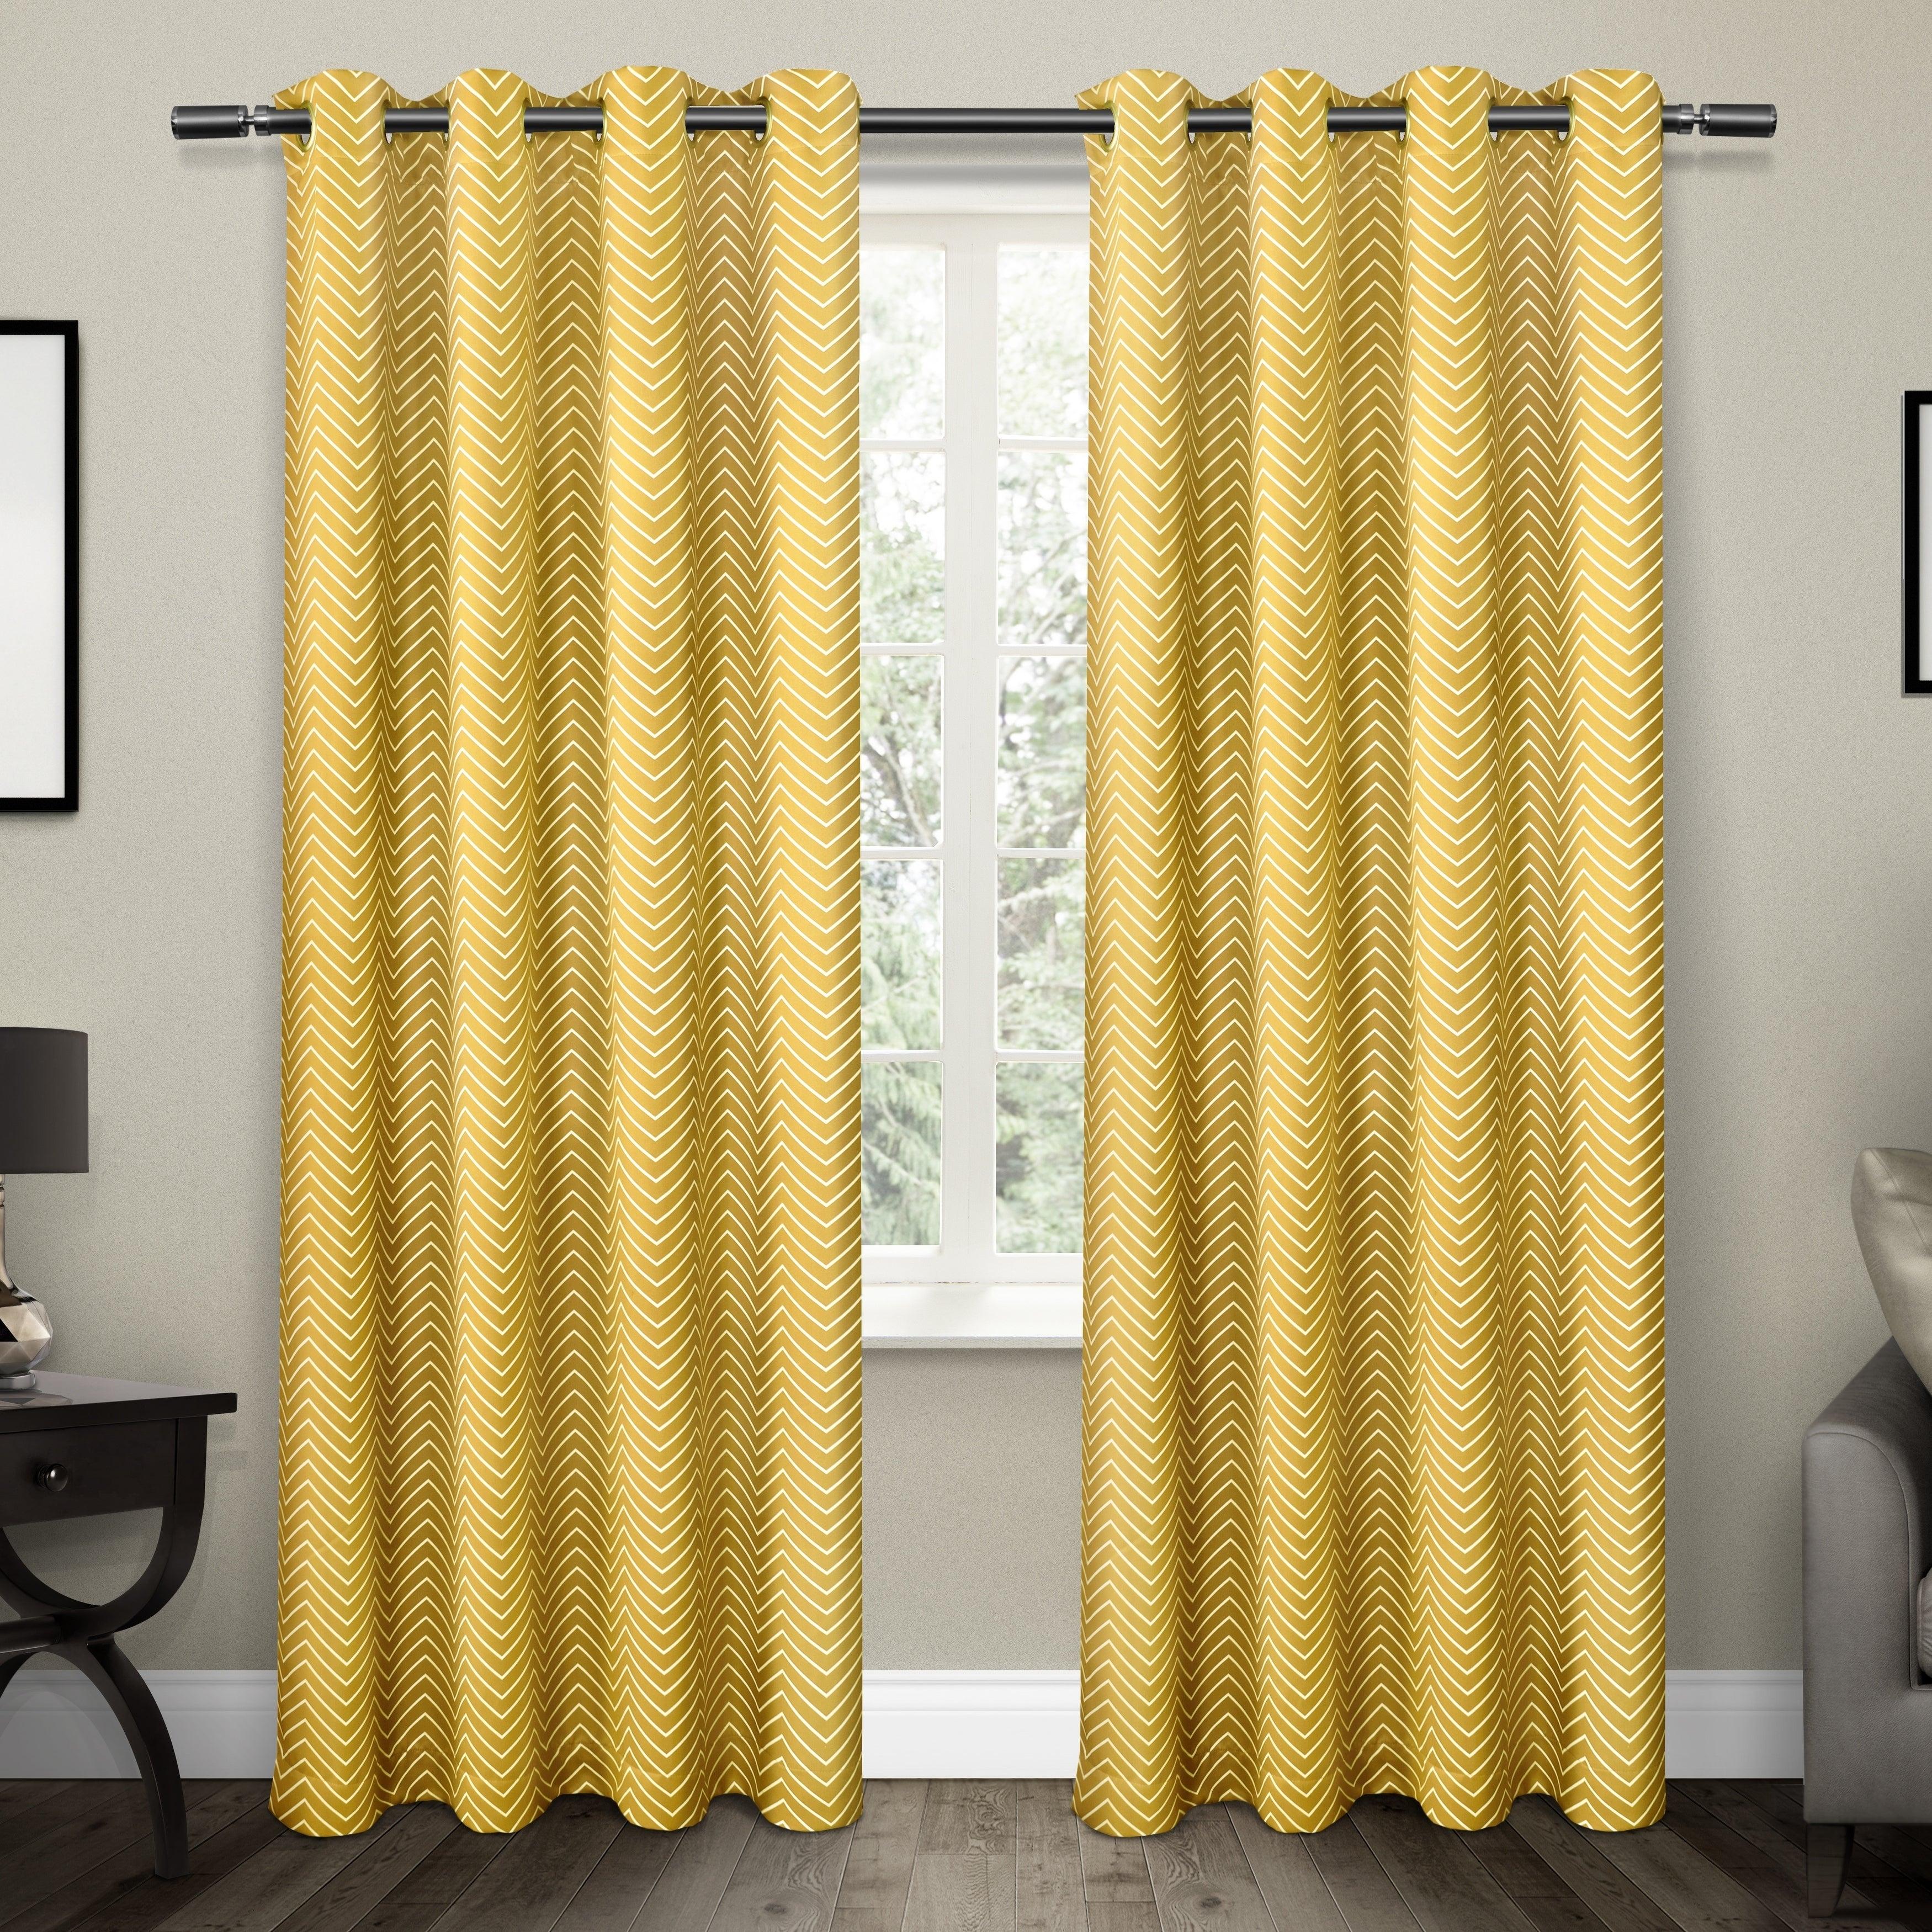 Ati Home Chevron Thermal Woven Blackout Grommet Top Curtain Panel Pair Regarding Chevron Blackout Grommet Curtain Panels (View 9 of 20)